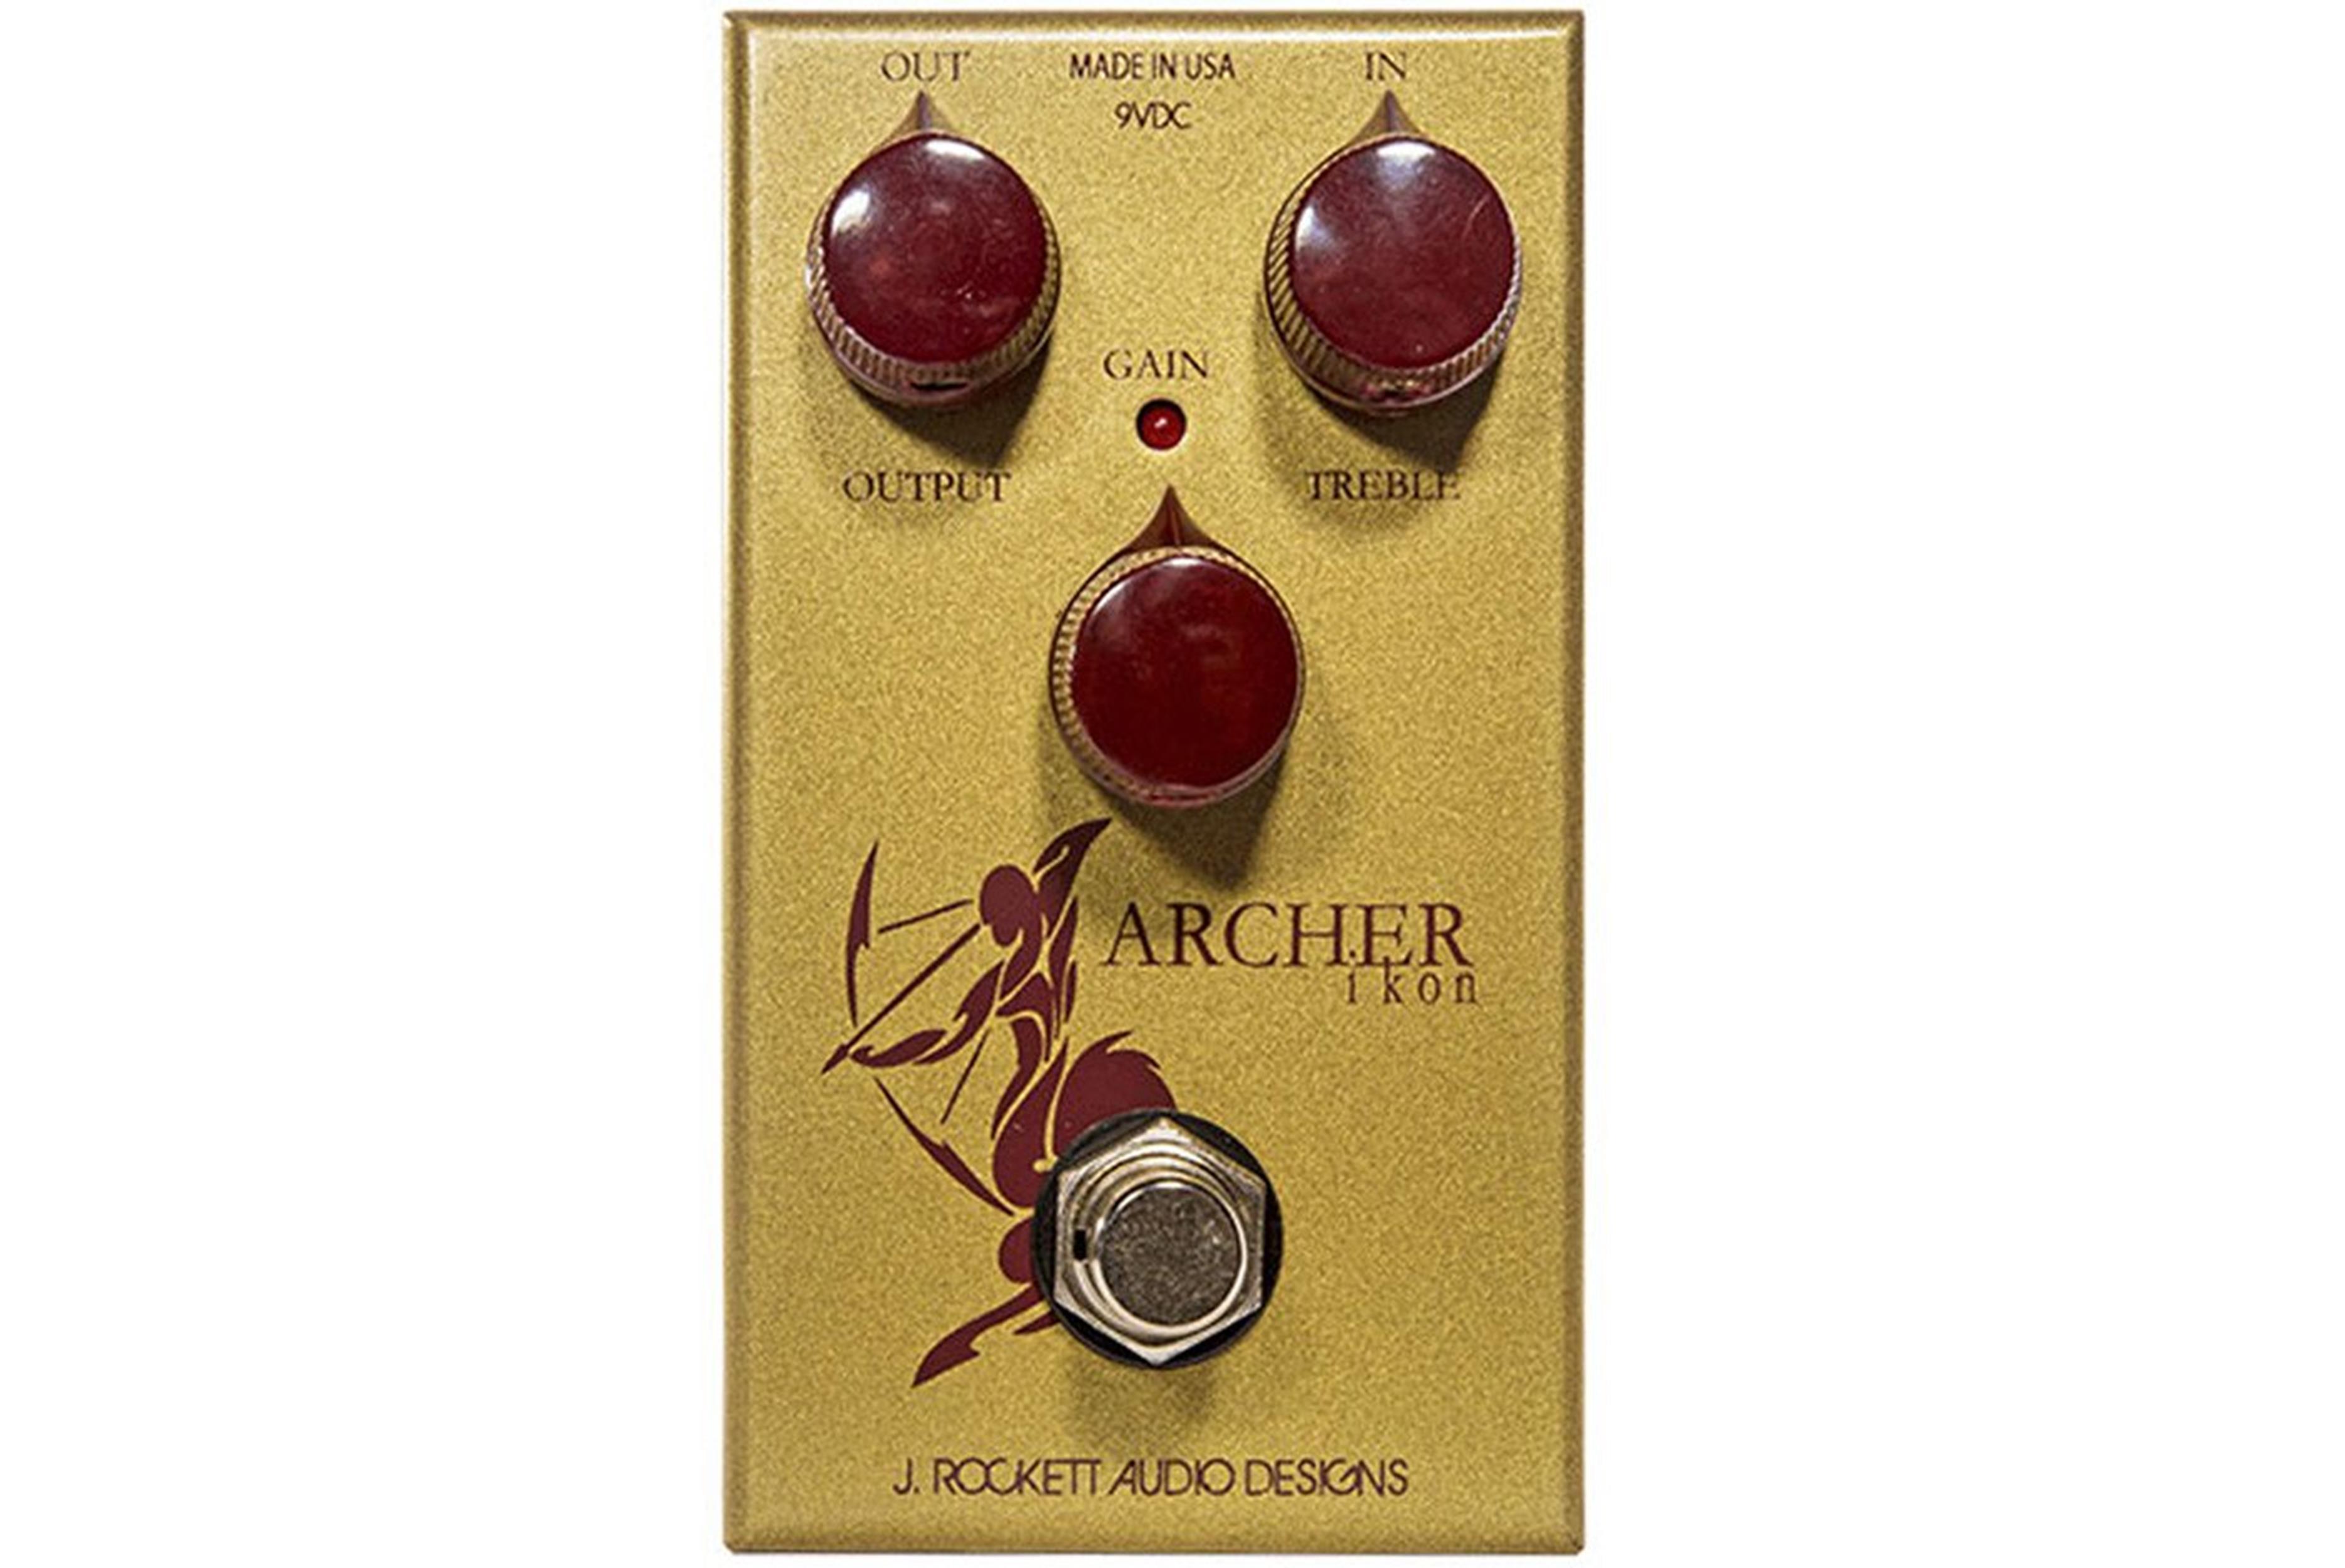 5 Archer Ikon